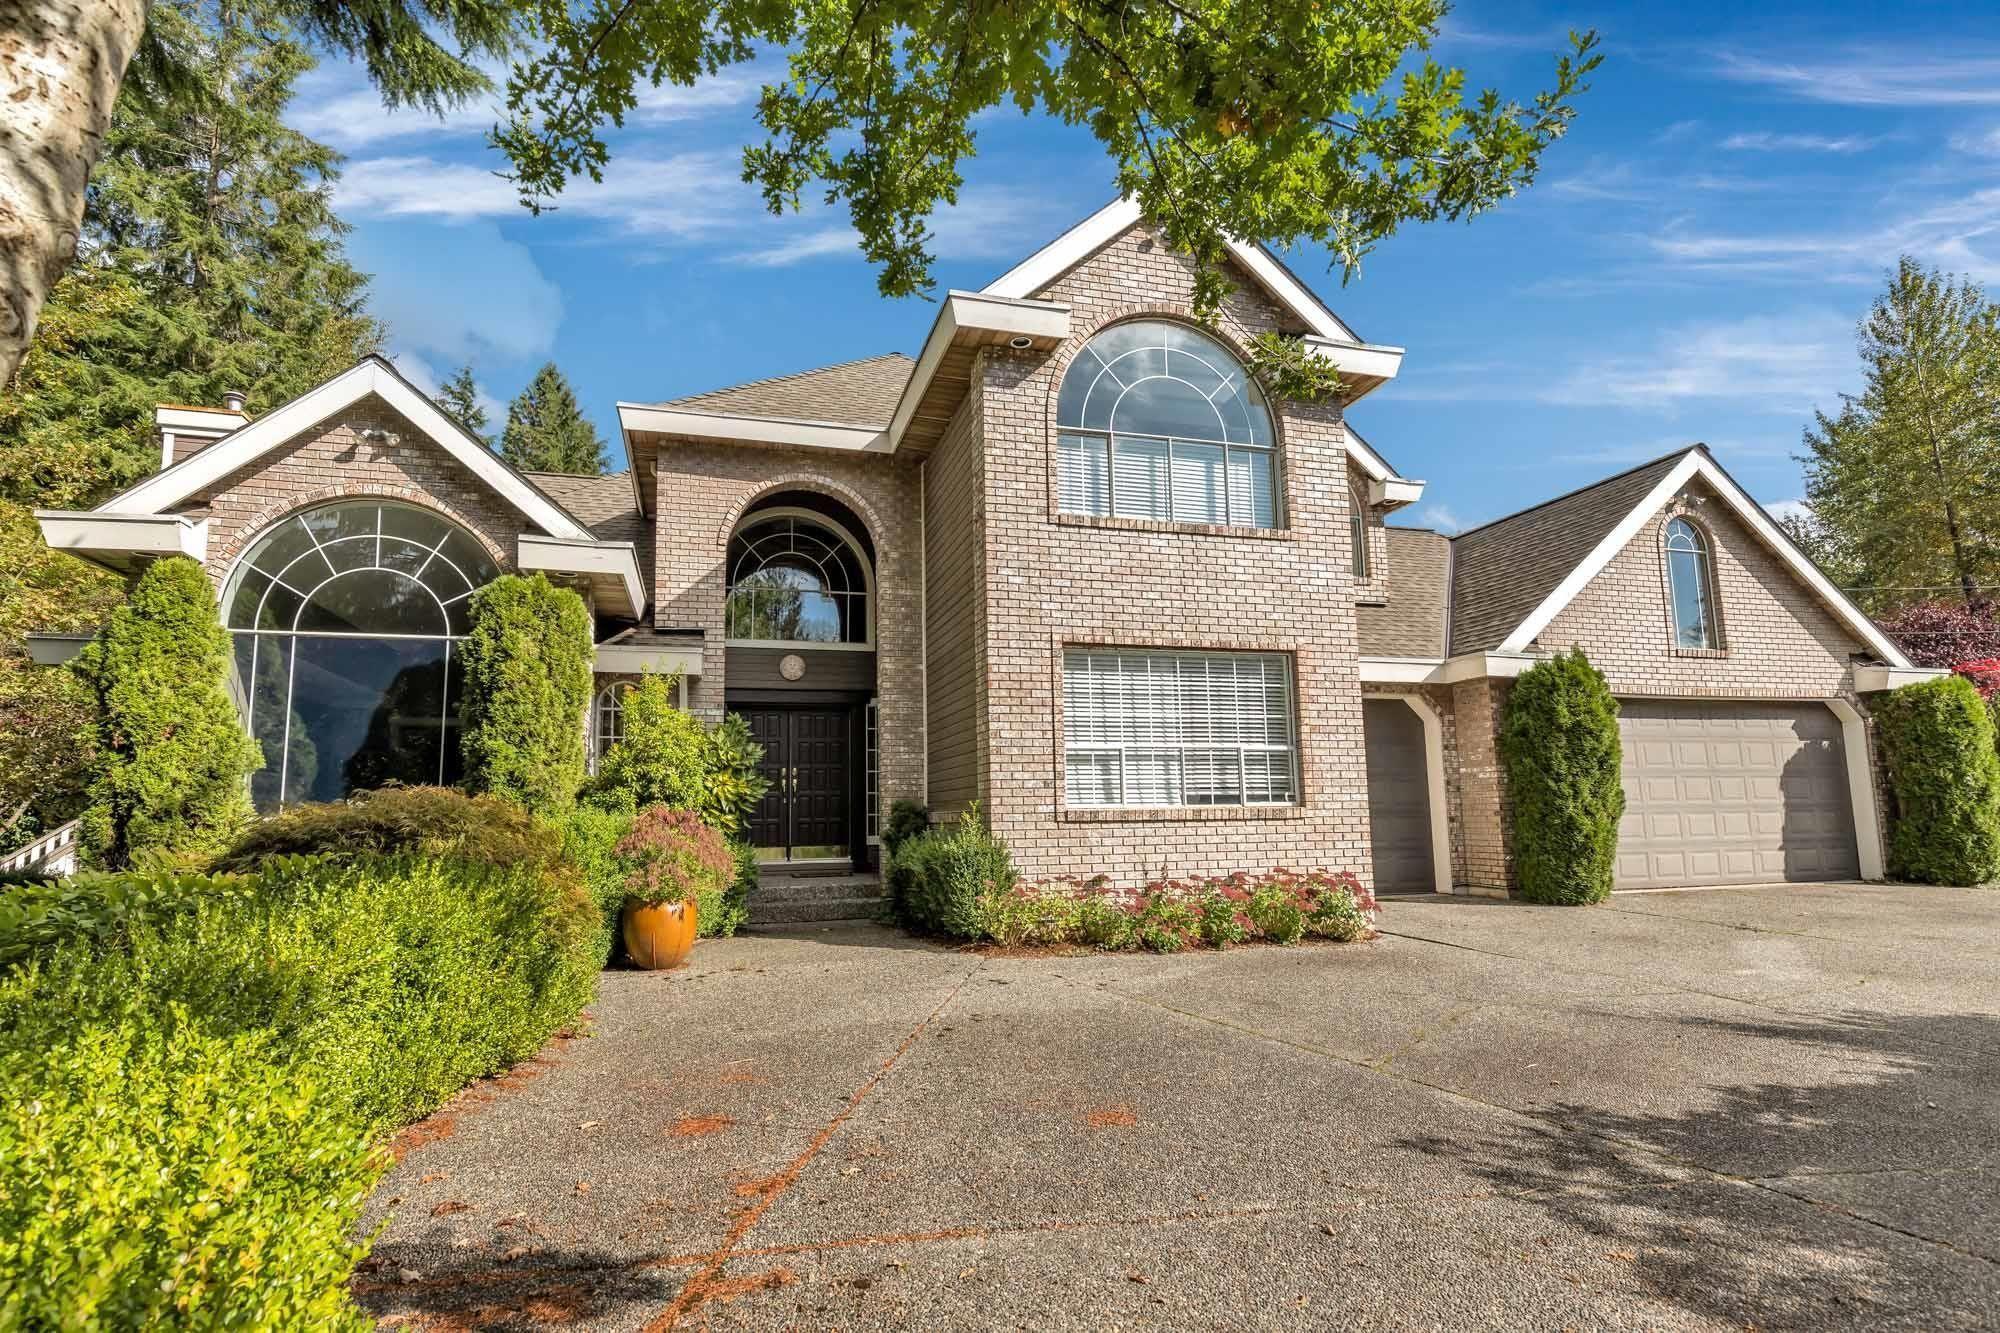 Main Photo: 12096 287 Street in Maple Ridge: Northeast House for sale : MLS®# R2624788